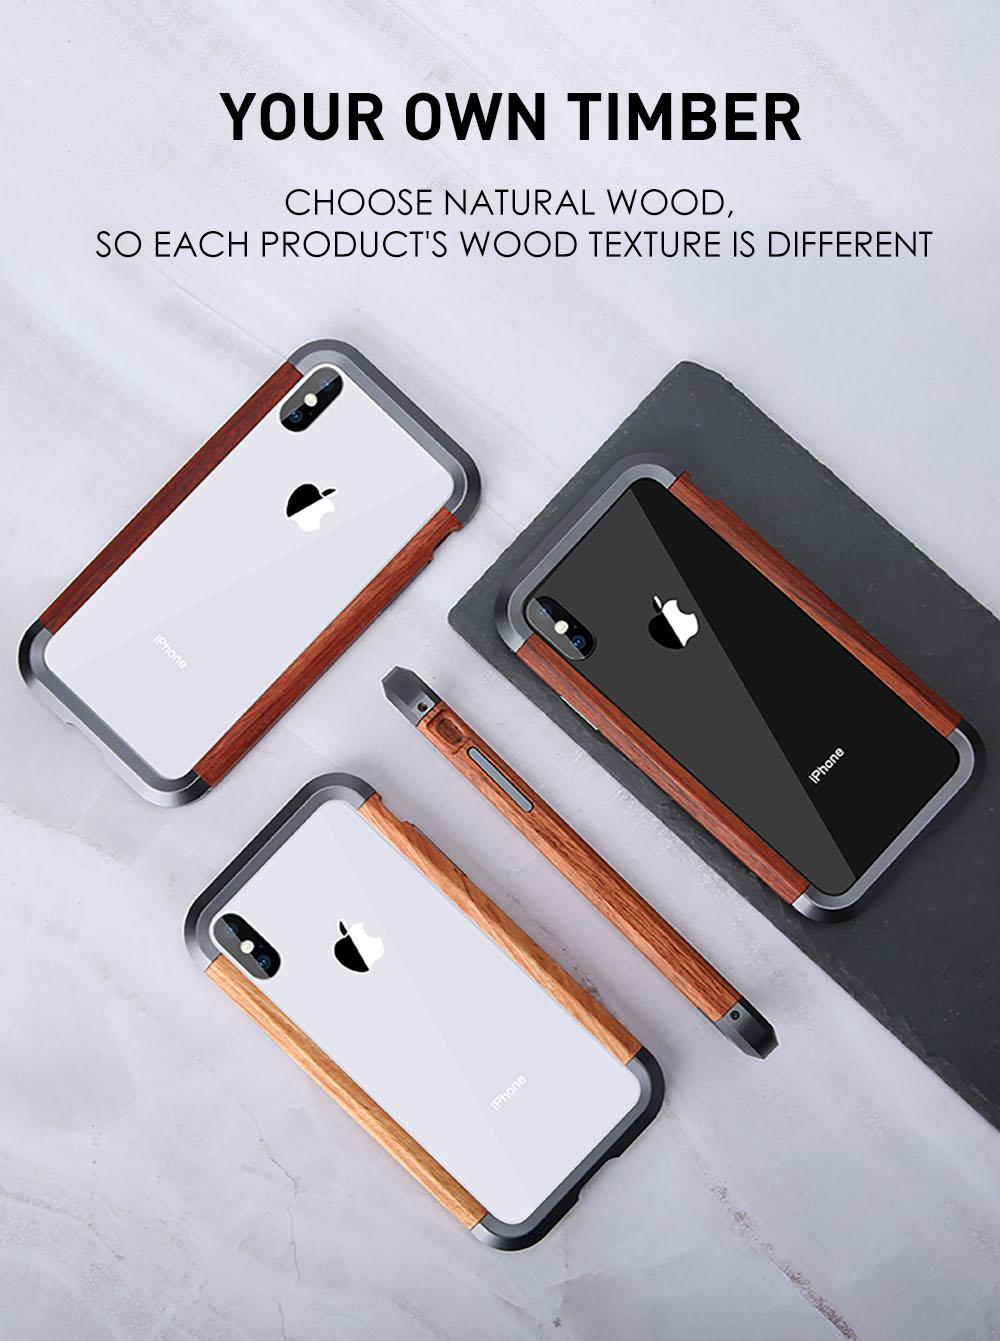 iPhone X/XS/XS Max case